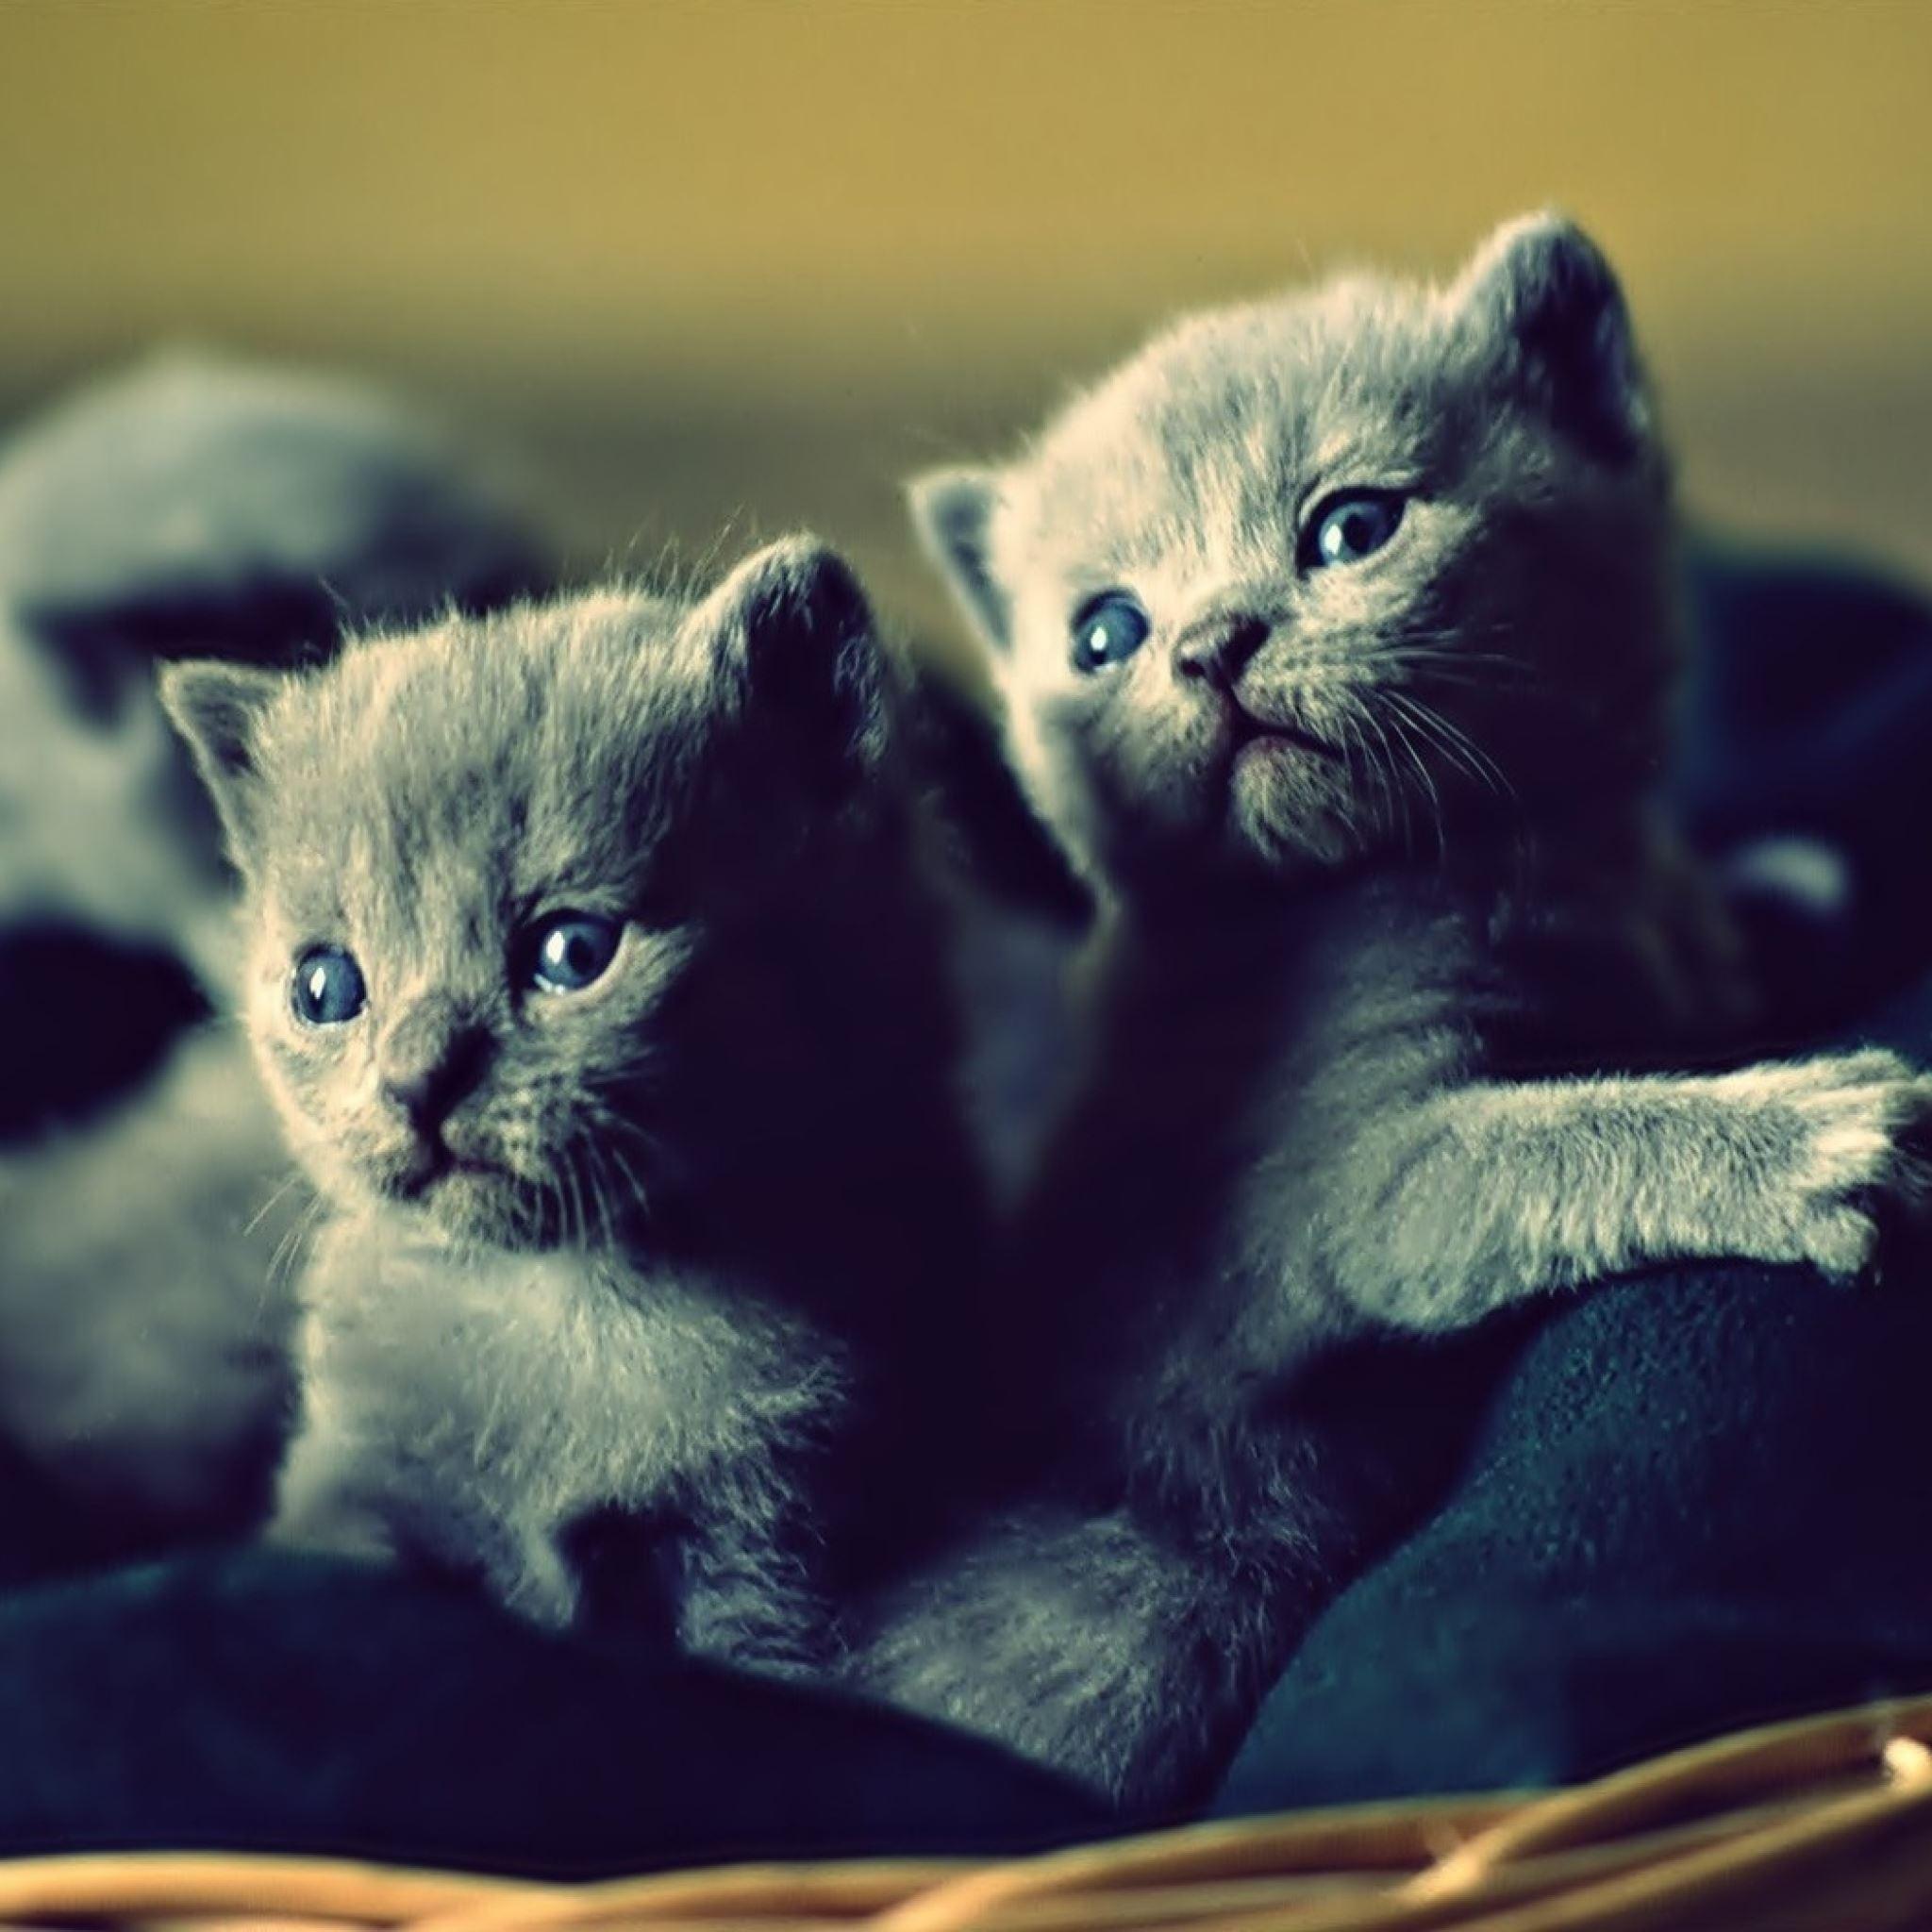 Kittens basket cute iPad Air wallpaper